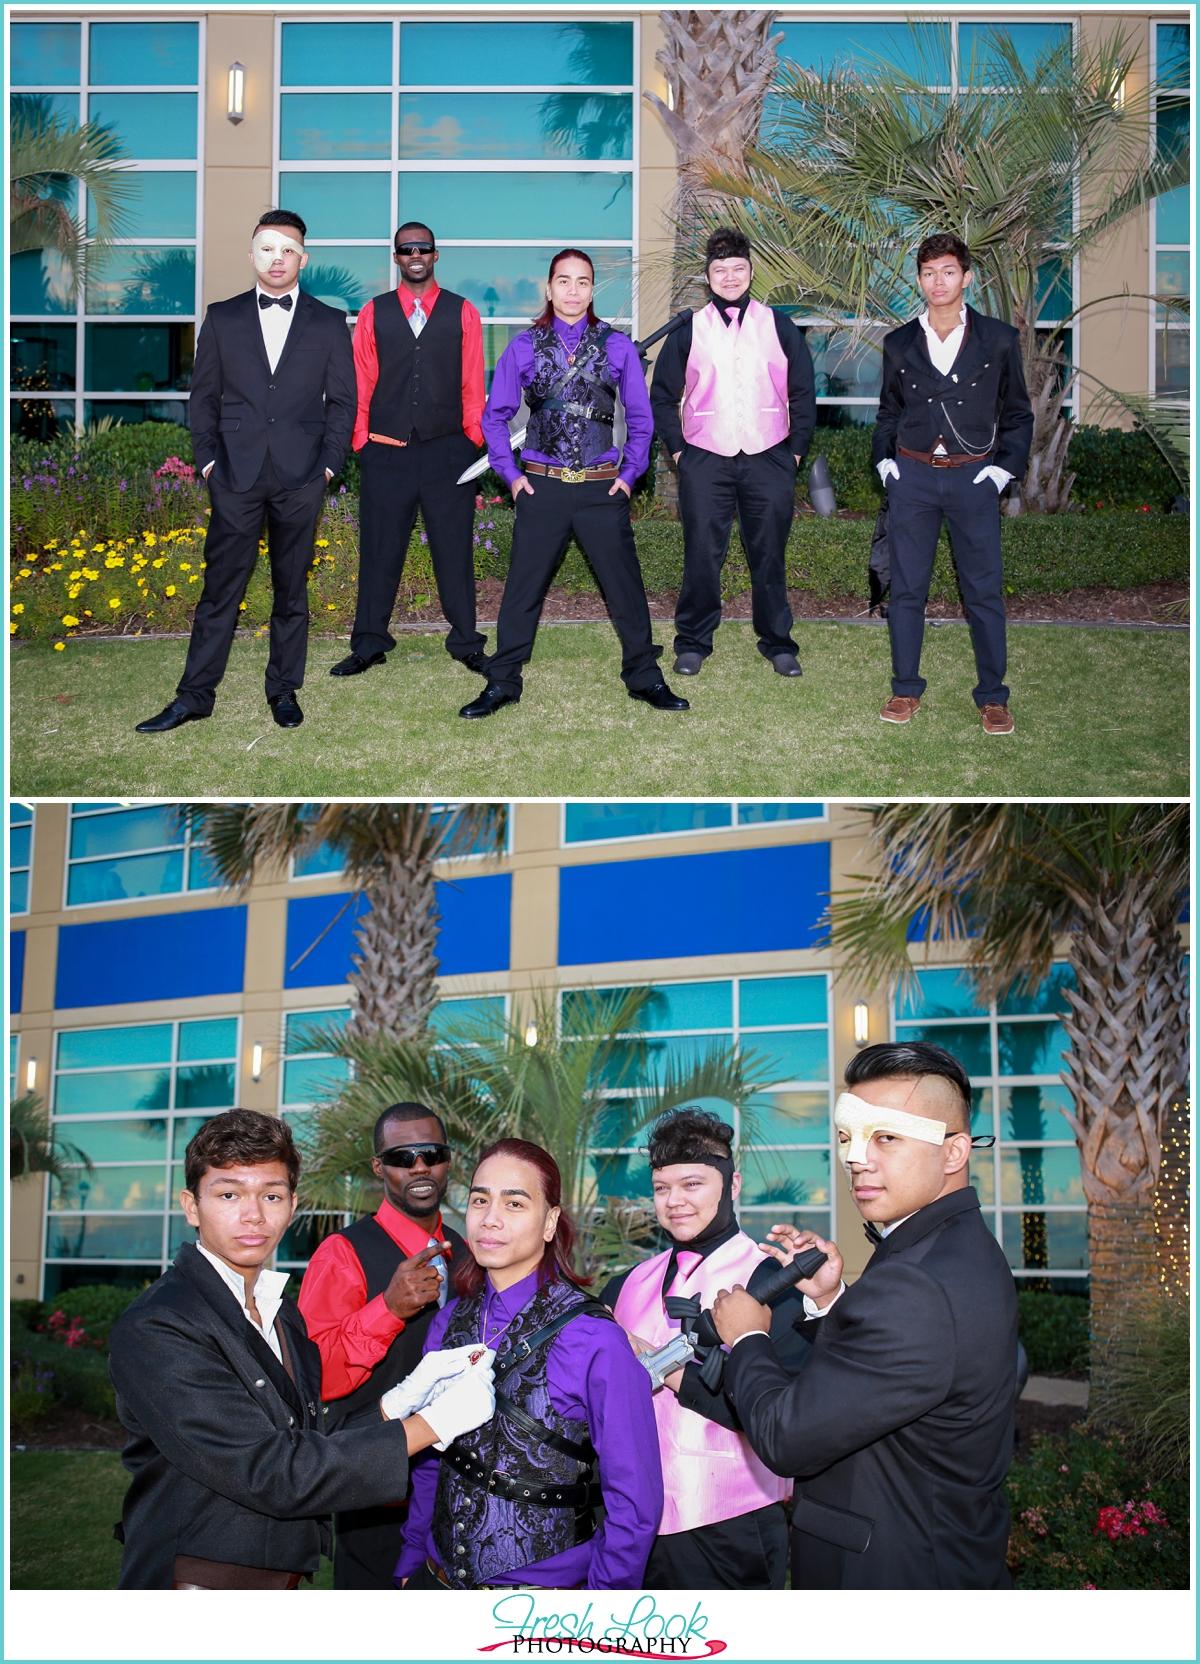 cosplay groom and groomsmen